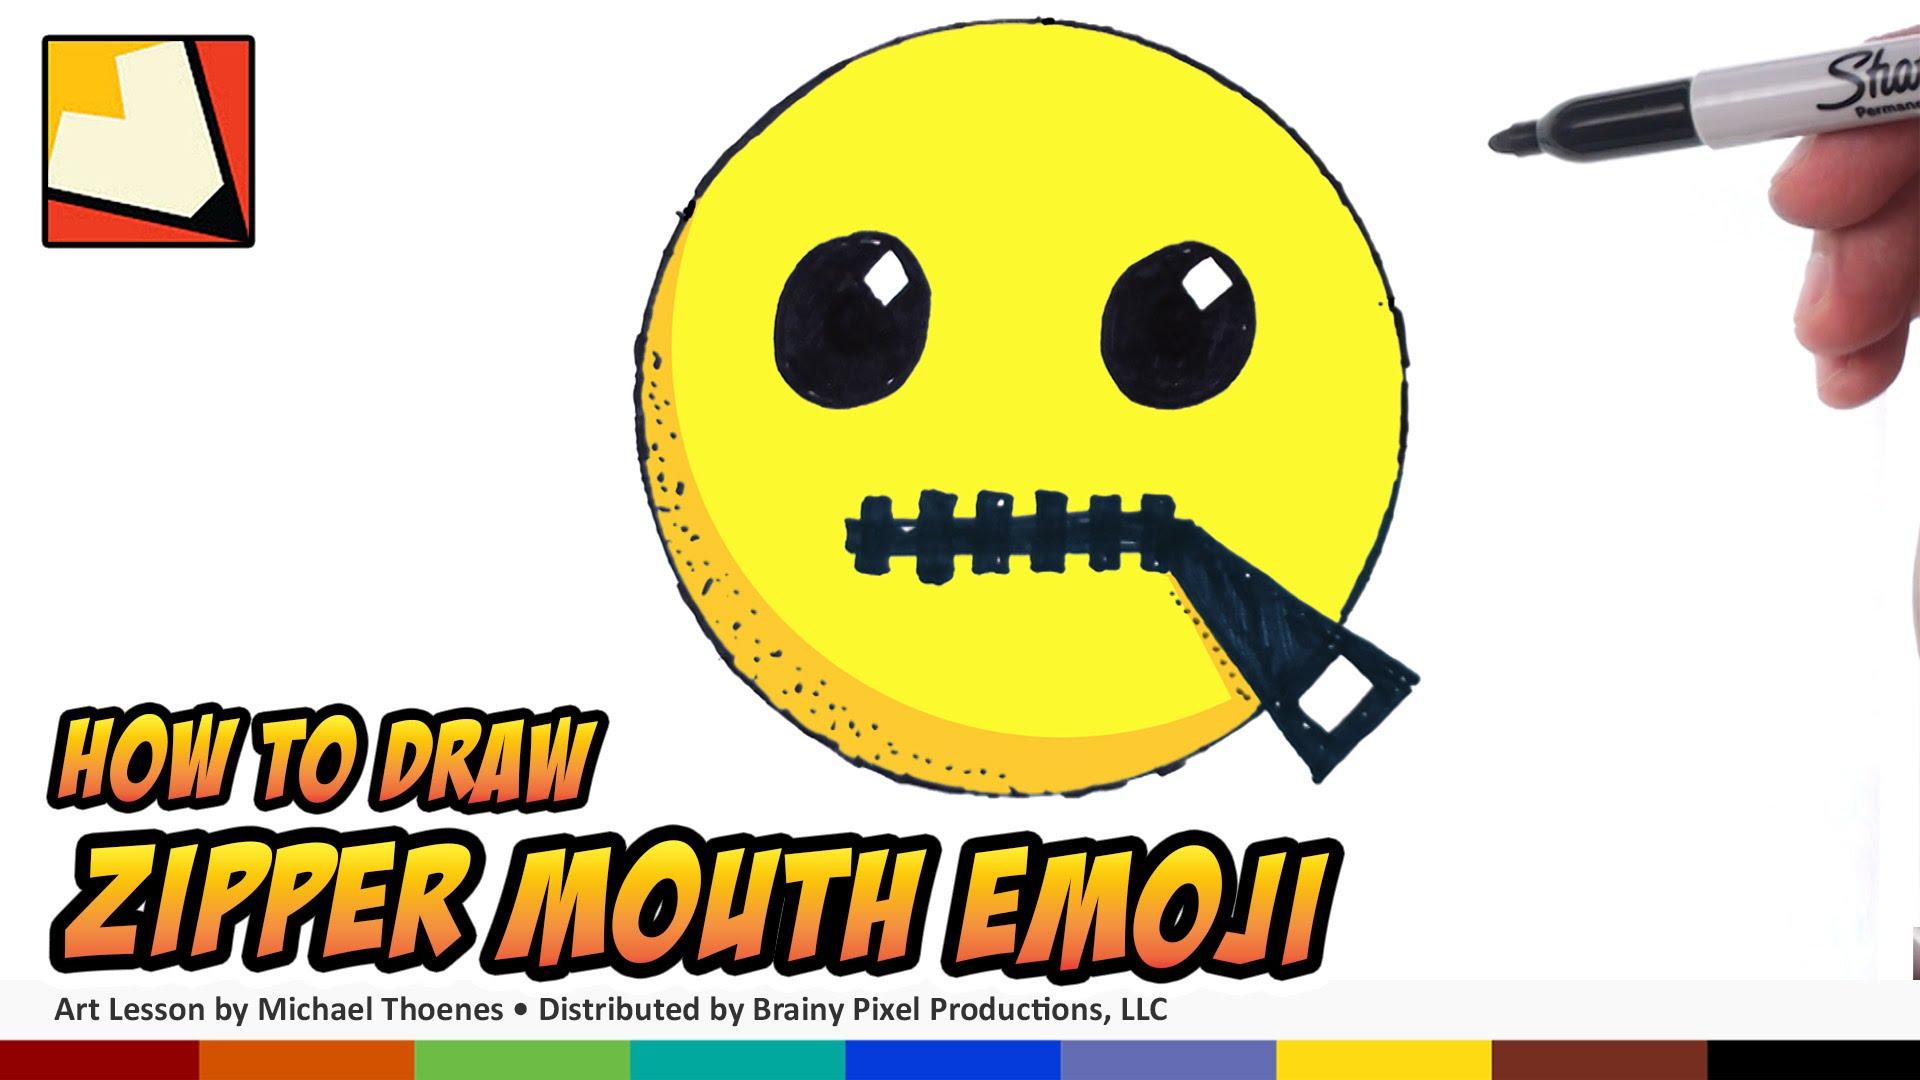 Drawn zipper zipper mouth By Emoji to How Step